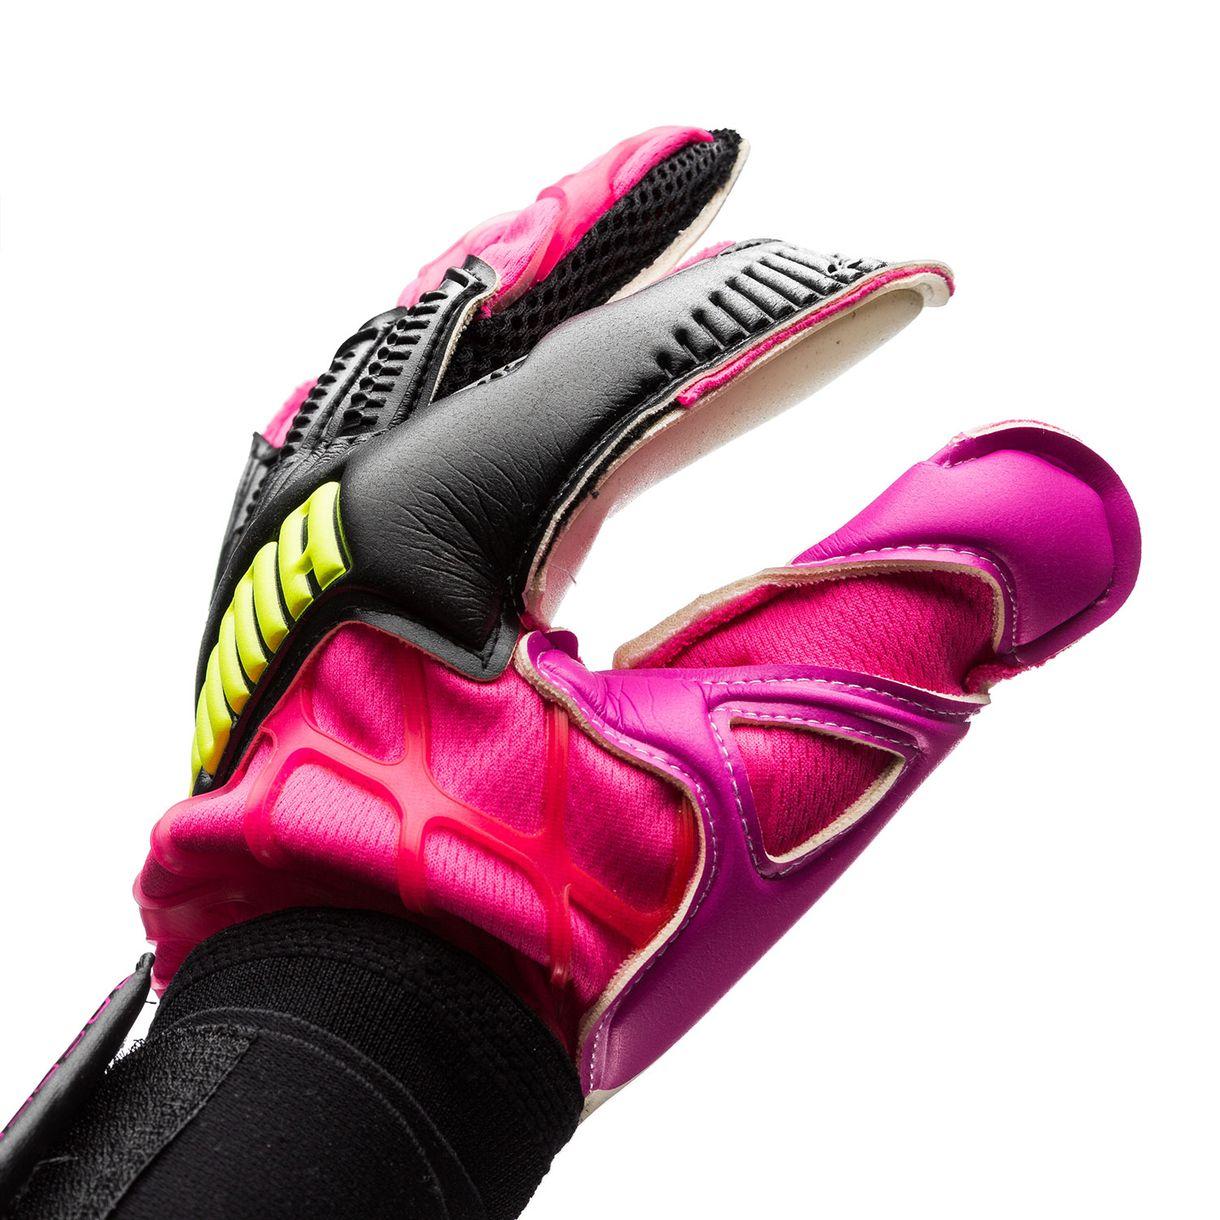 PUMA Goalkeeper Gloves evoSPEED 1.4 Tricks Pink Glow ...